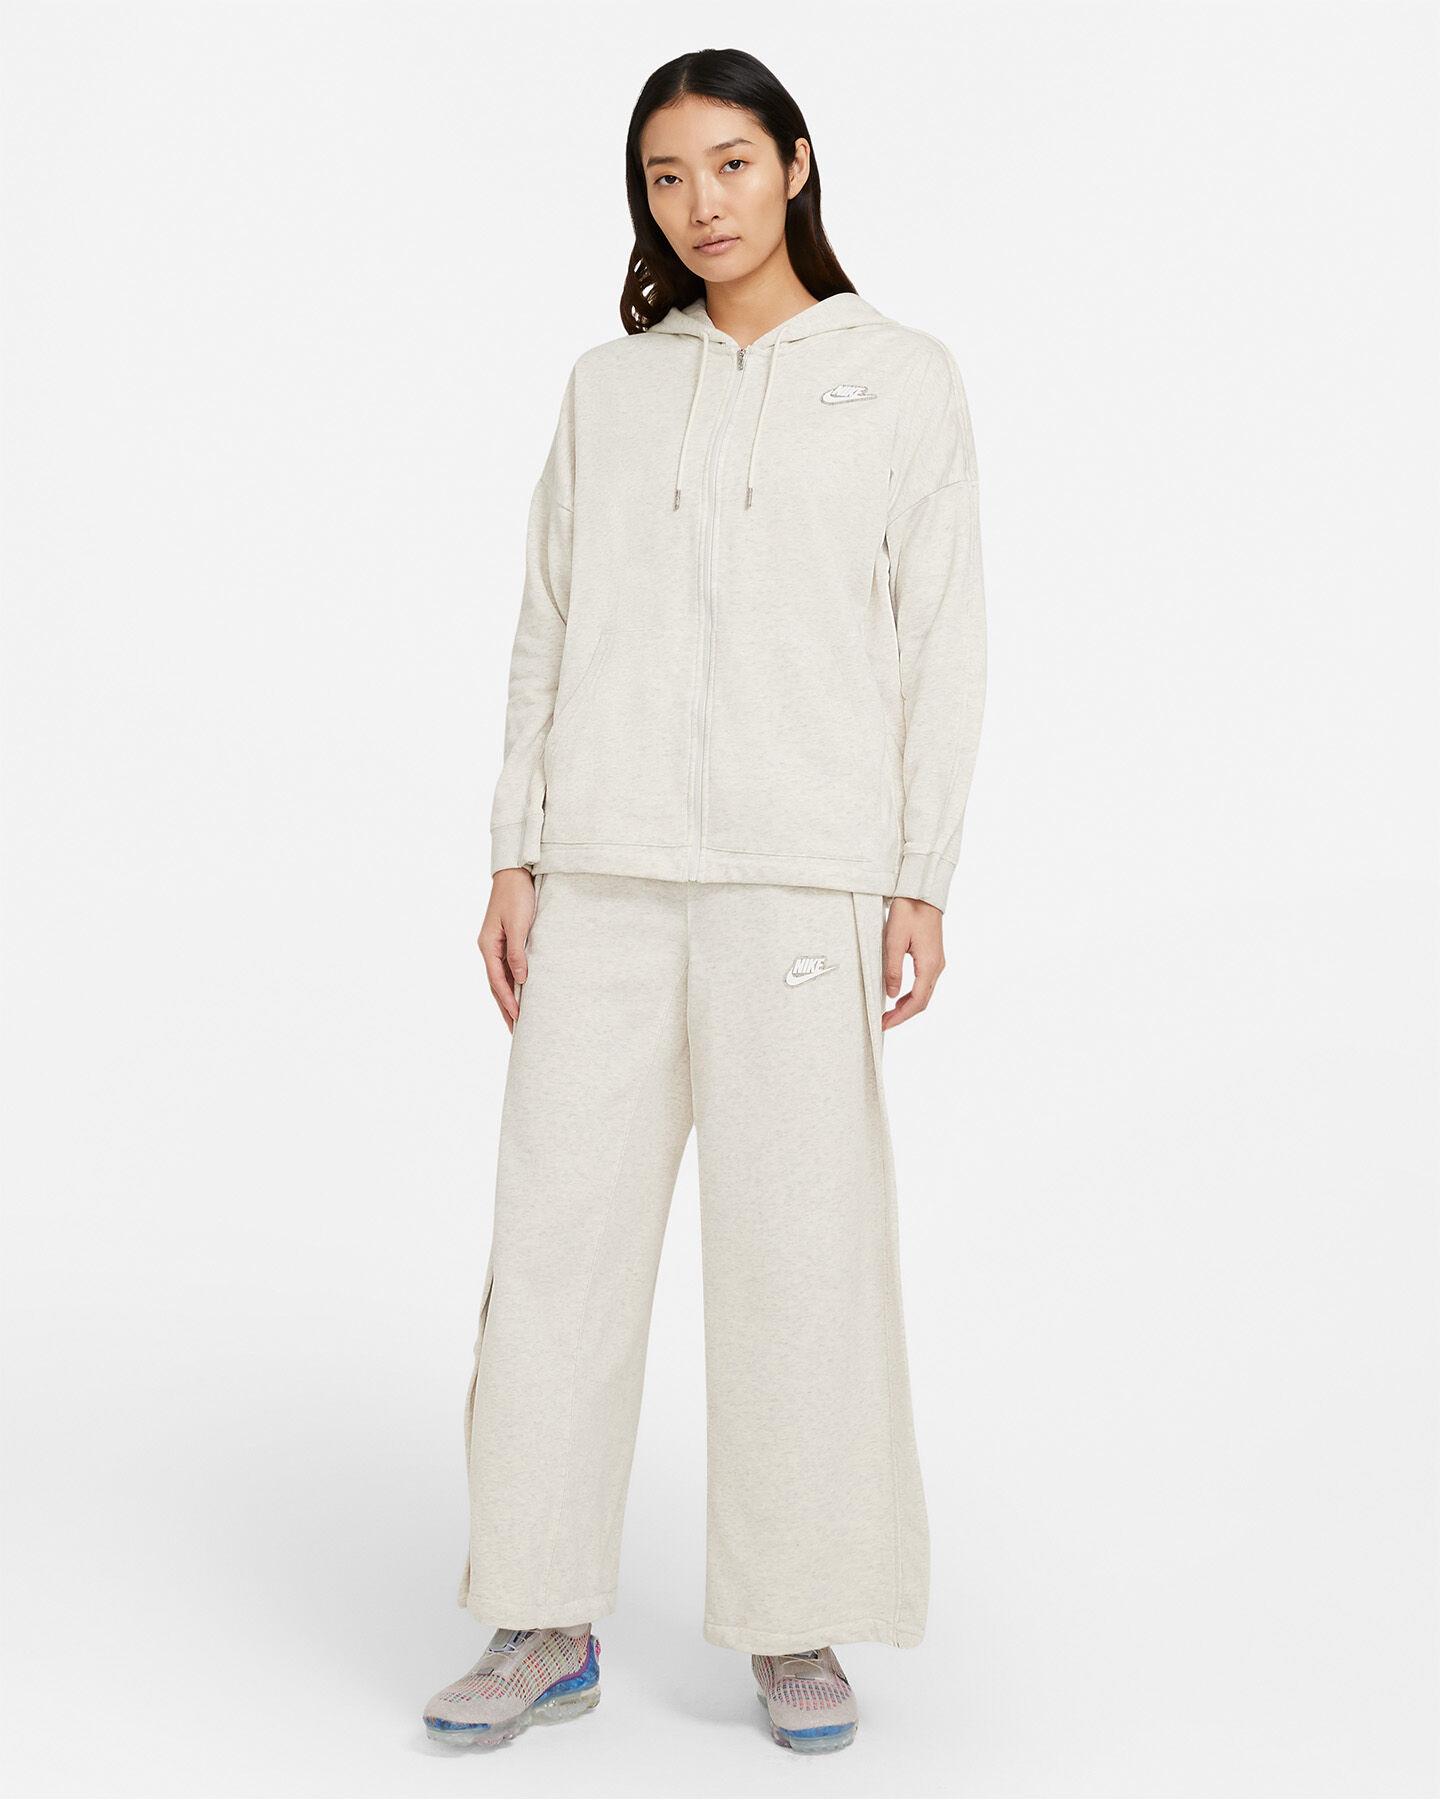 Pantalone NIKE EARTH DAY W S5269771 scatto 5